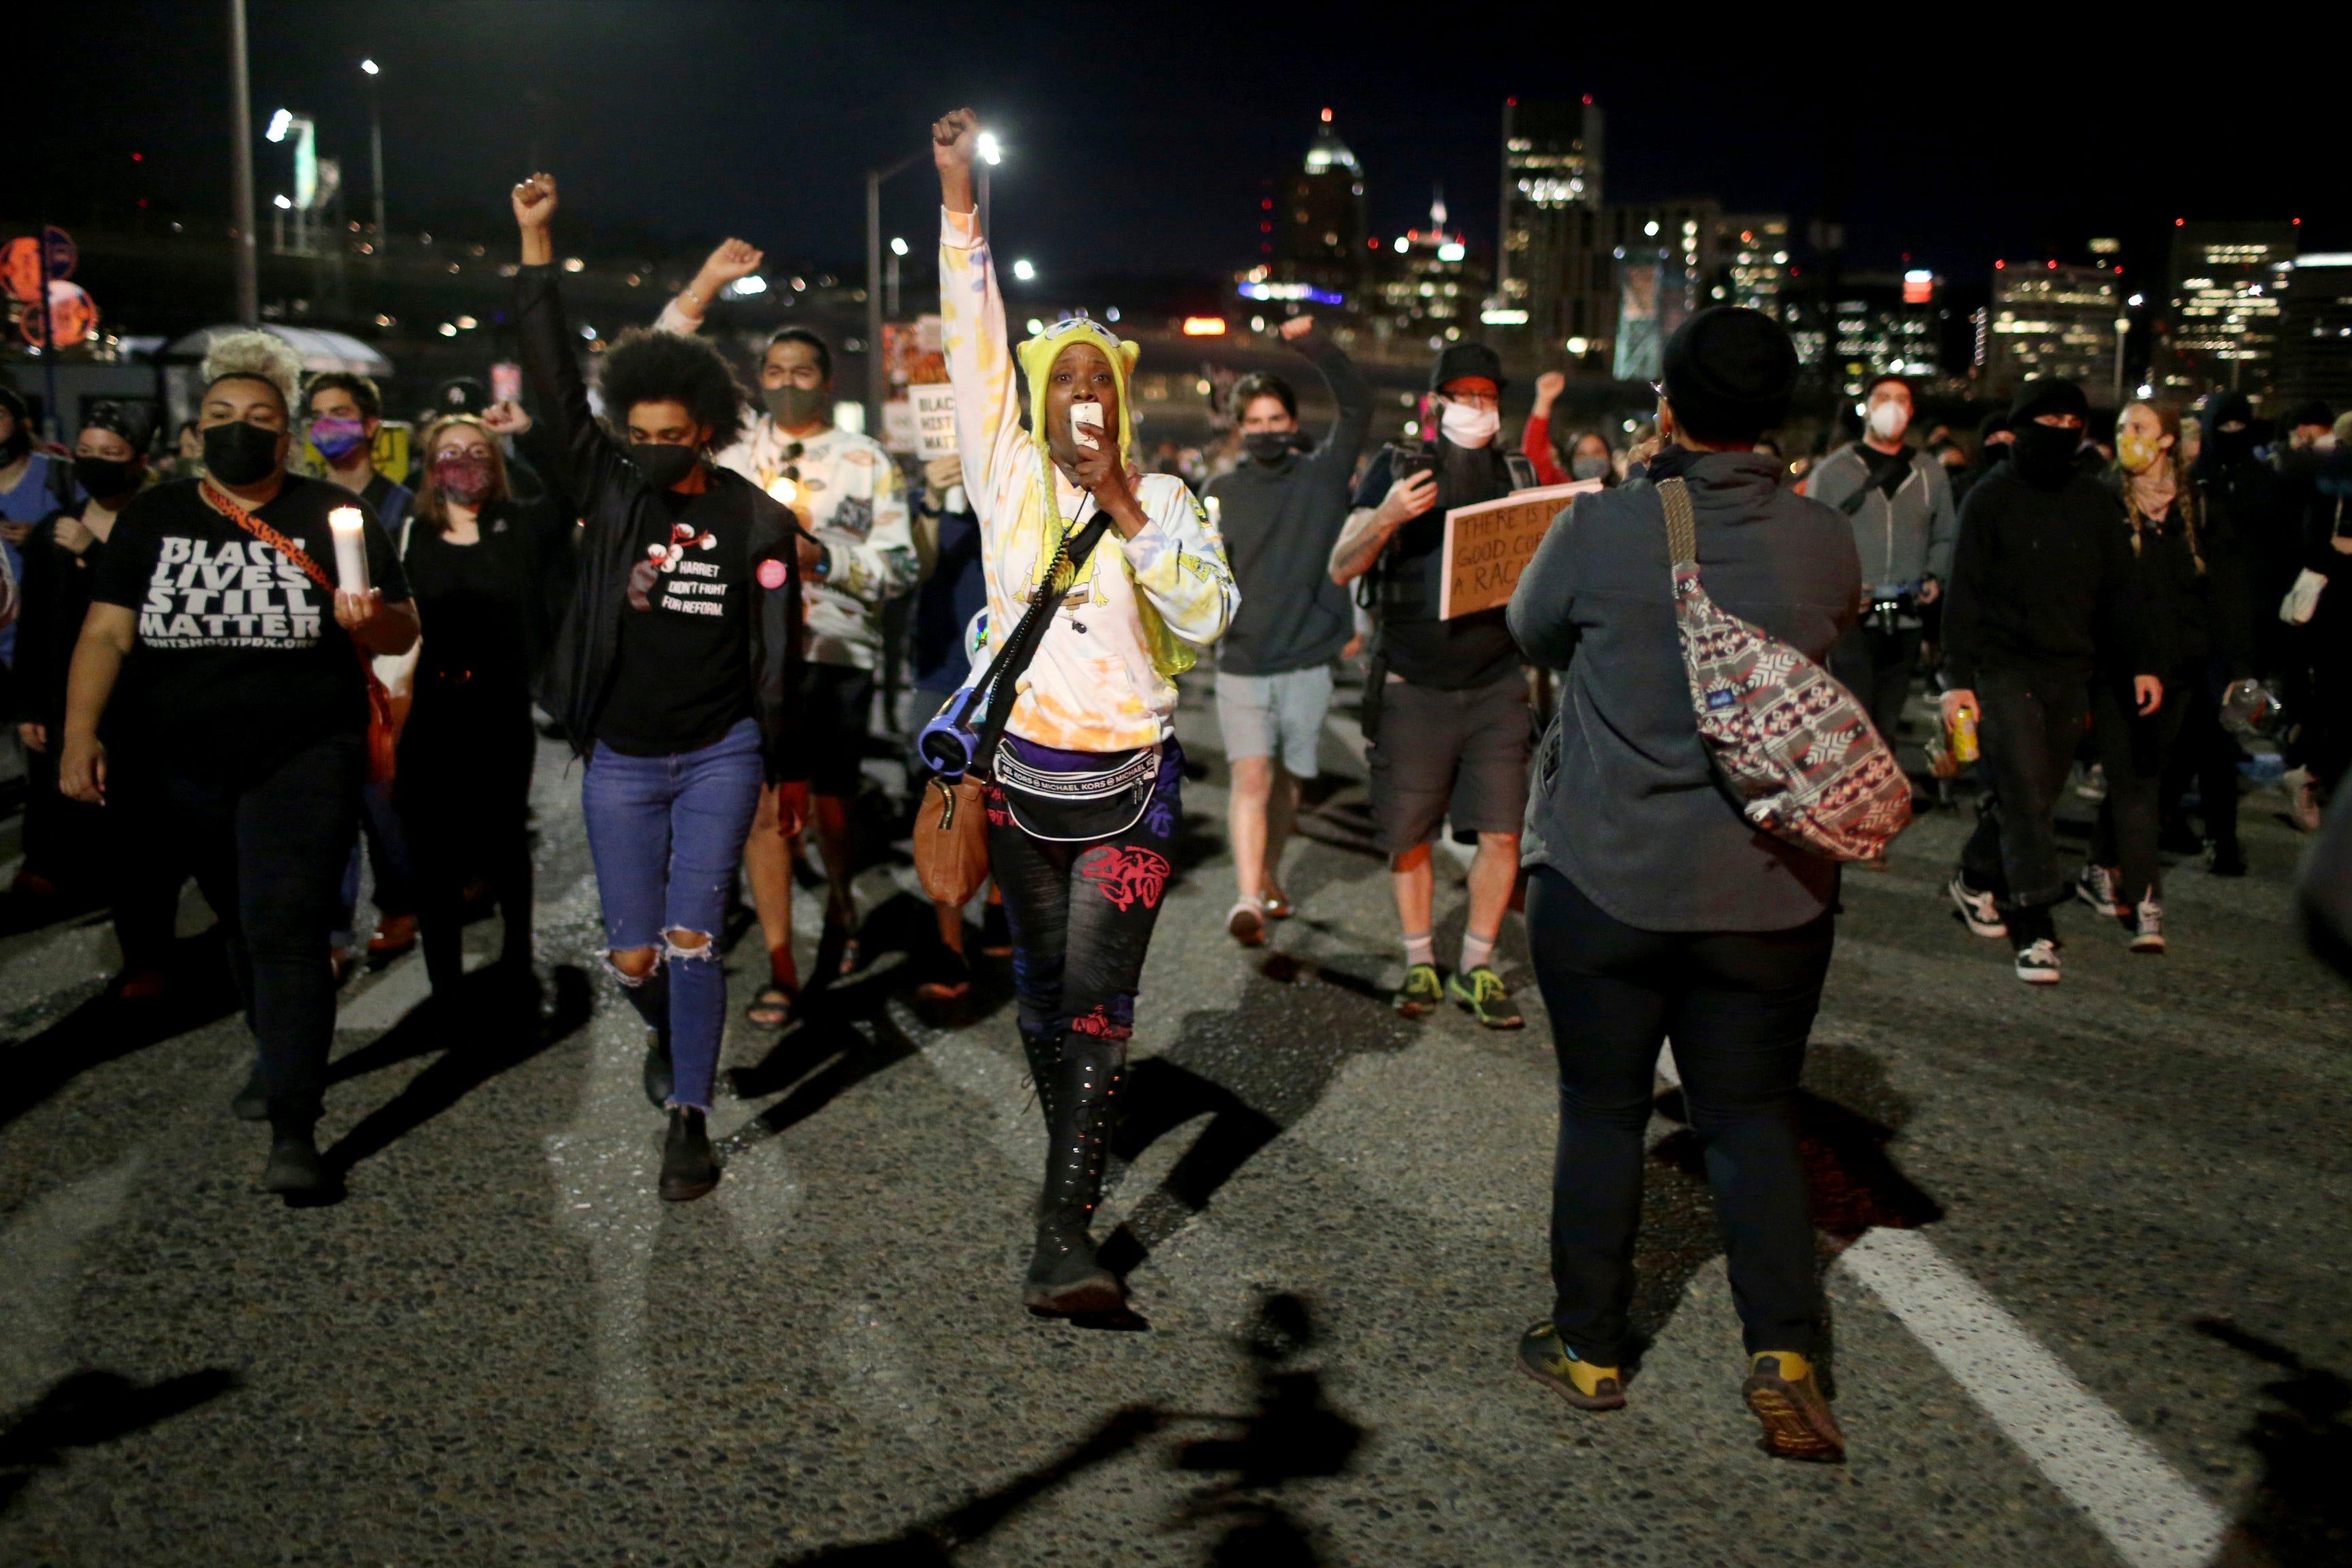 Riot declared after Portland protesters burglarize businesses, set fires 1